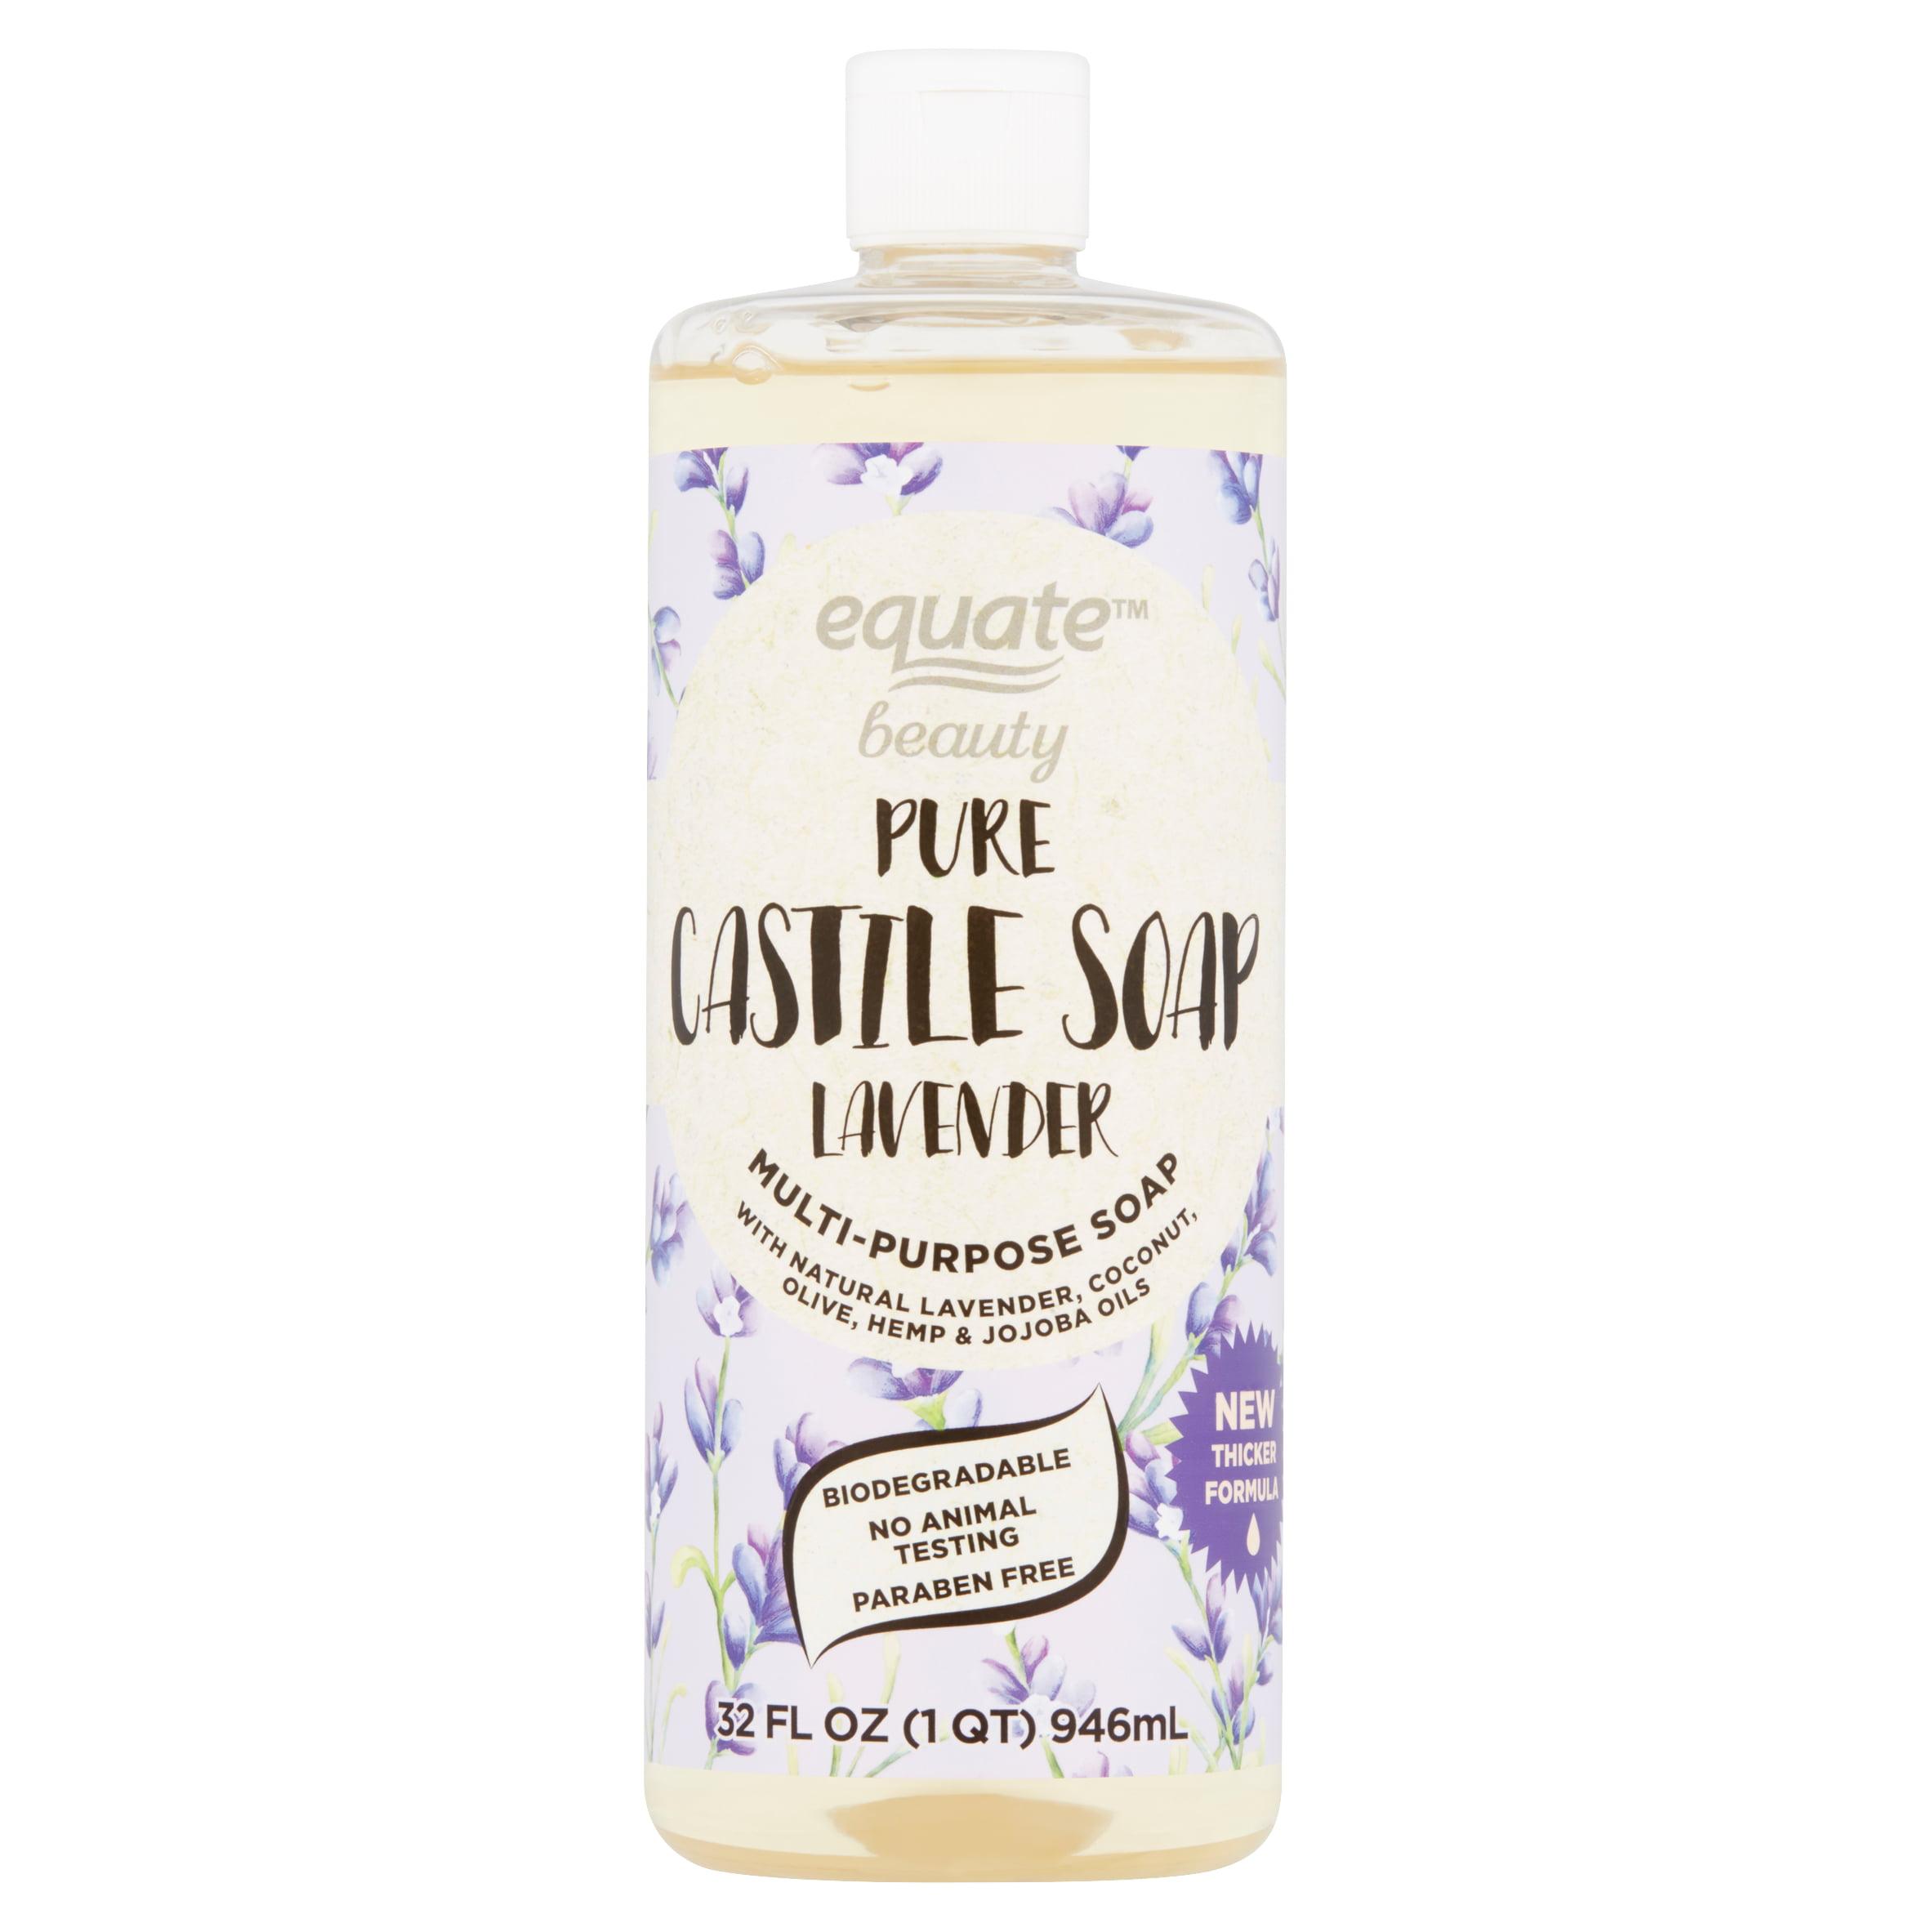 Equate Beauty Lavender Pure Castile Soap 32 Fl Oz Walmart Com Walmart Com